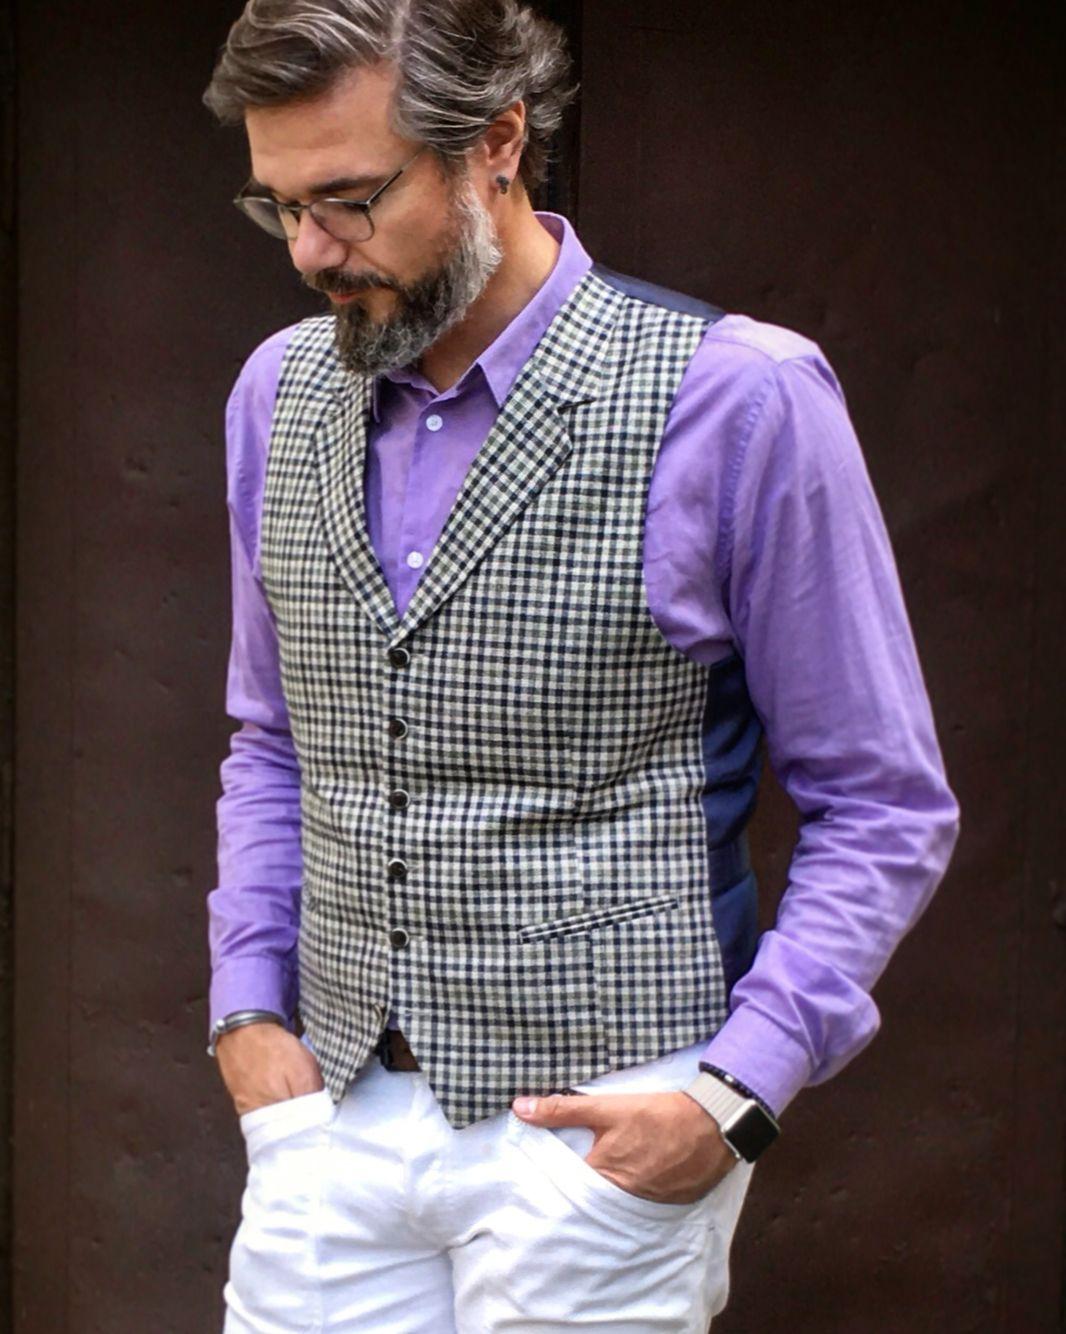 0b21f4ba0d A look with beard, waistcoat, white jeans and purple shirt. #dapper #man # style #beard